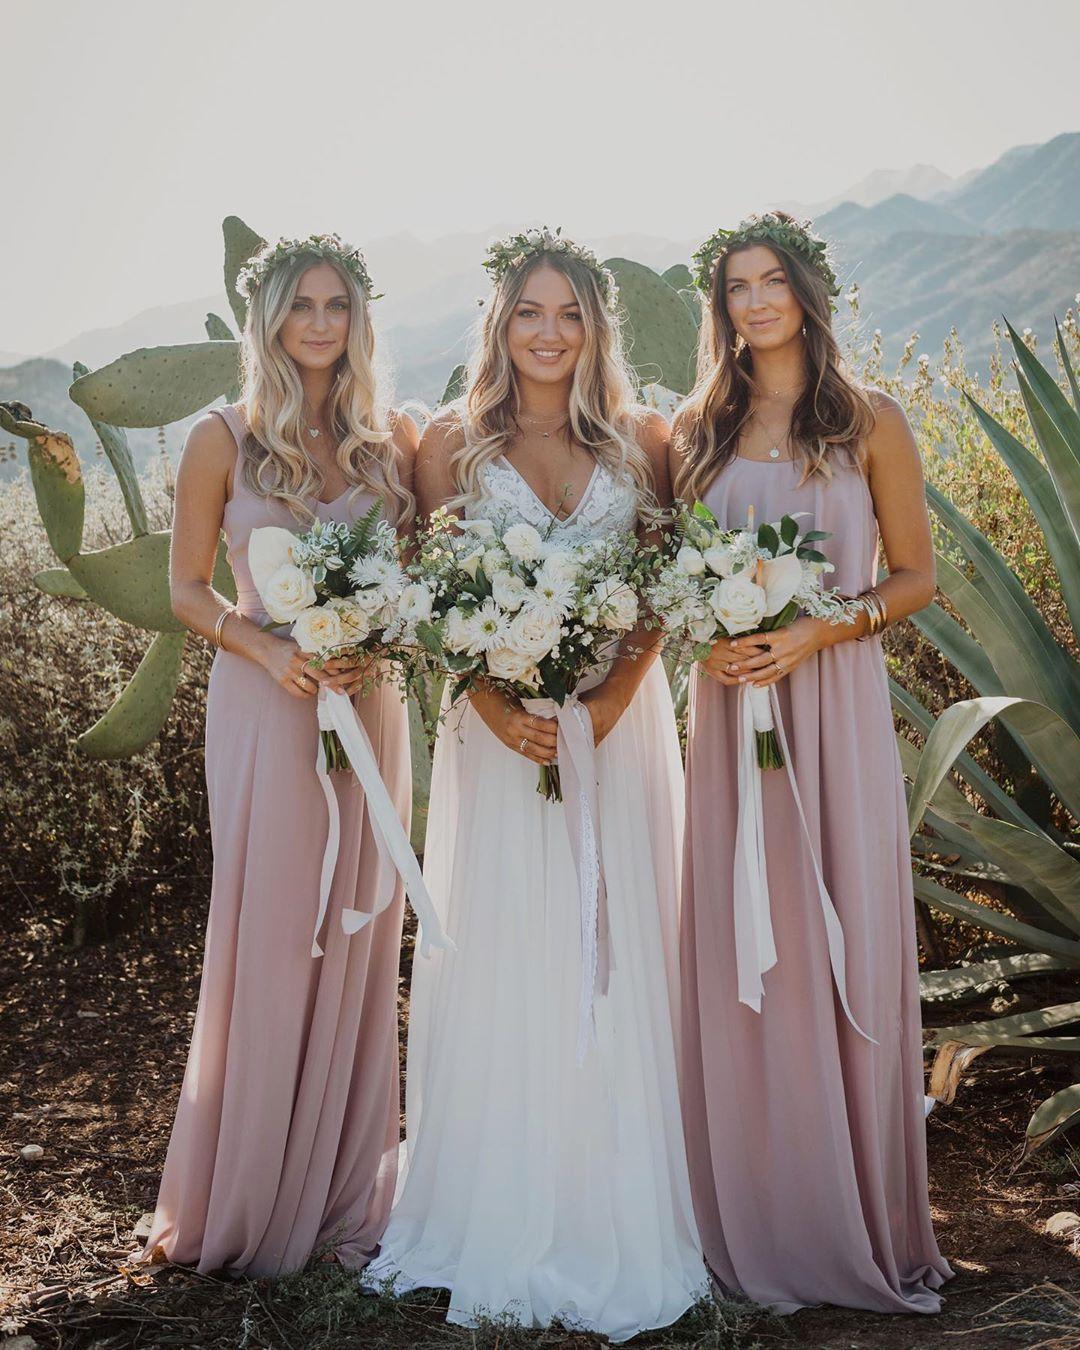 Mumu Weddings On Instagram Bridesmaids In The Desert Wearing Neutral Mauv In 2020 Mauve Bridesmaid Dress Muave Bridesmaid Dresses Neutral Bridesmaid Dresses